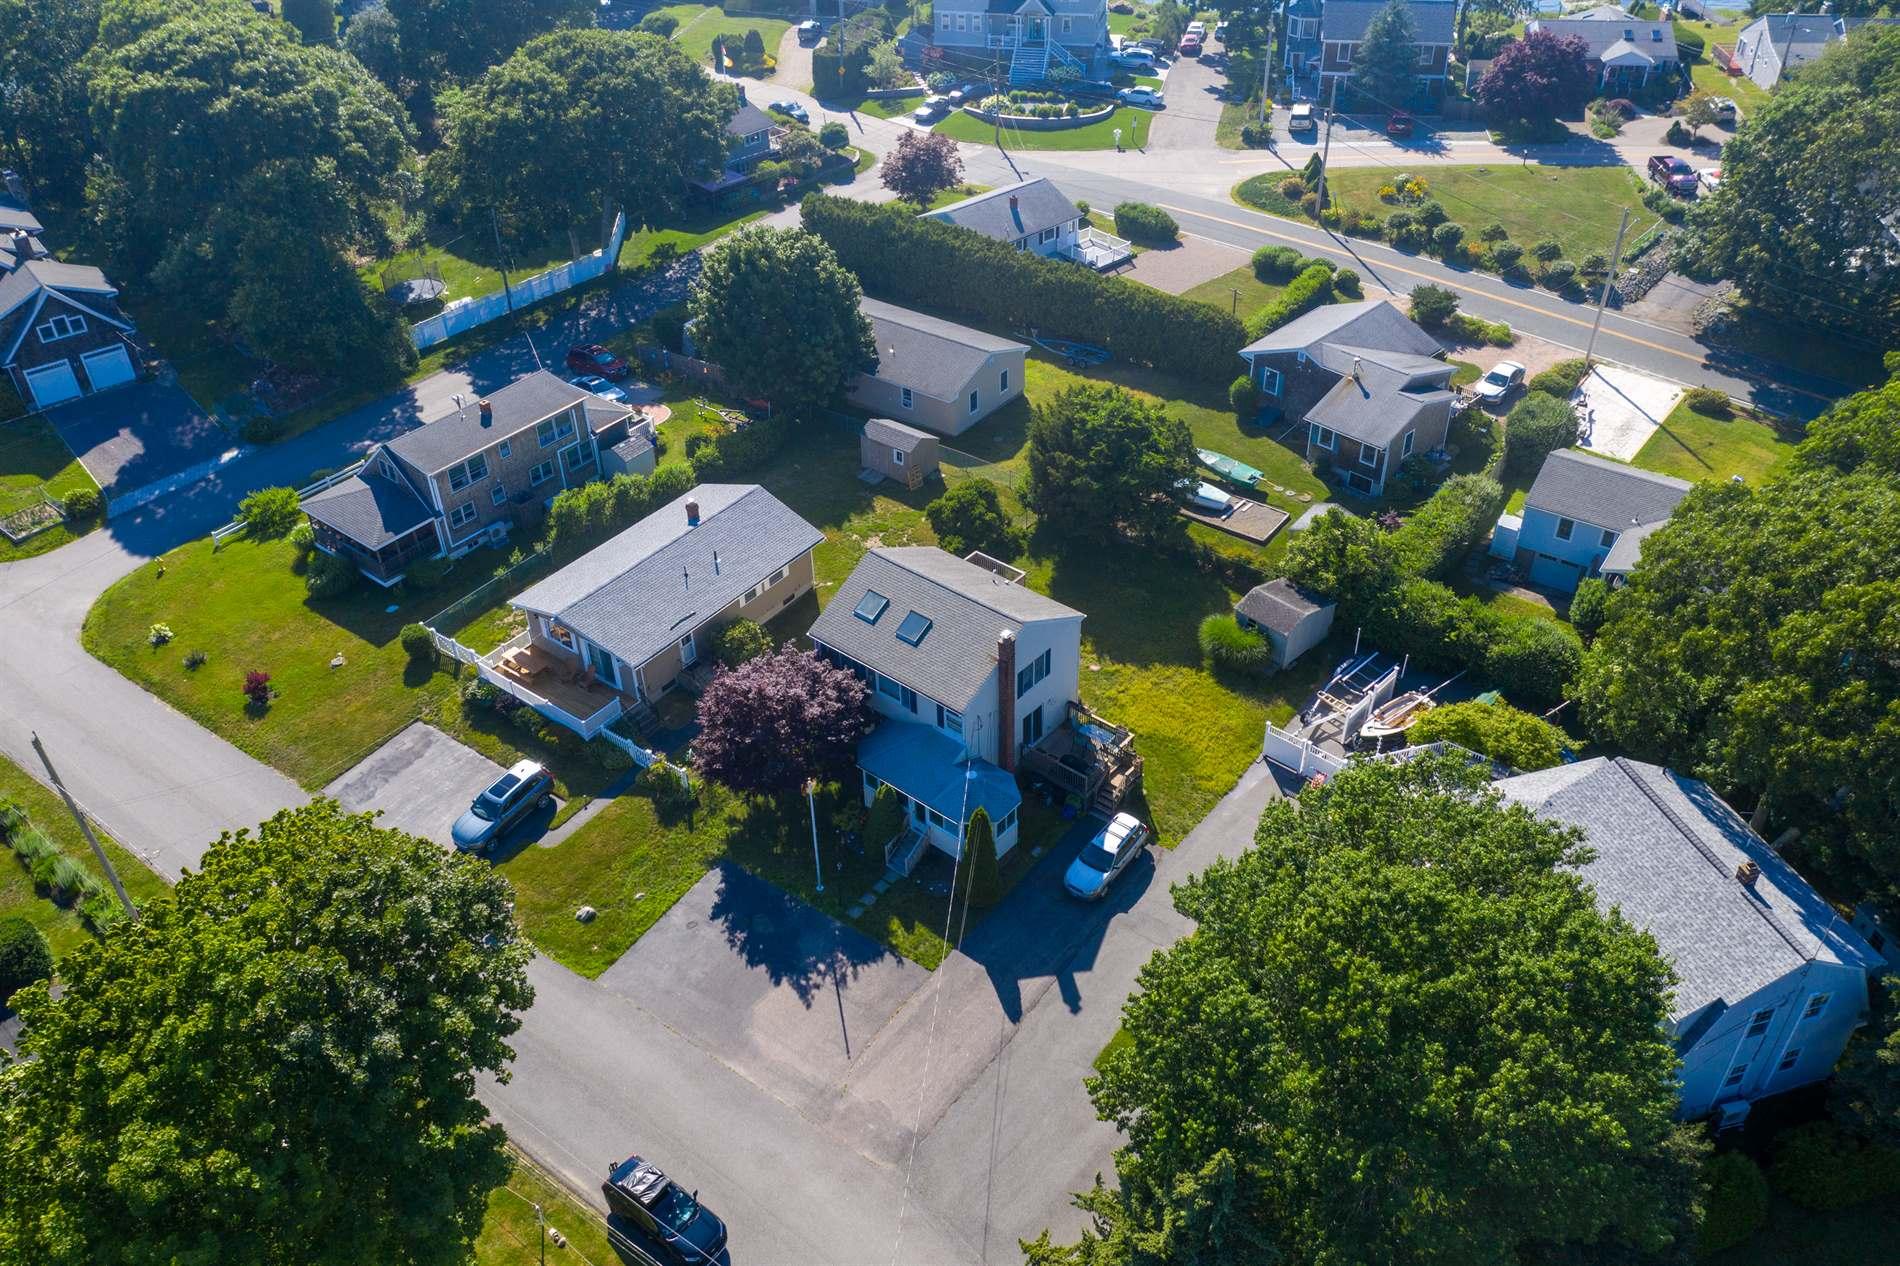 53 Flintstone Road Road, Narragansett, RI 02882